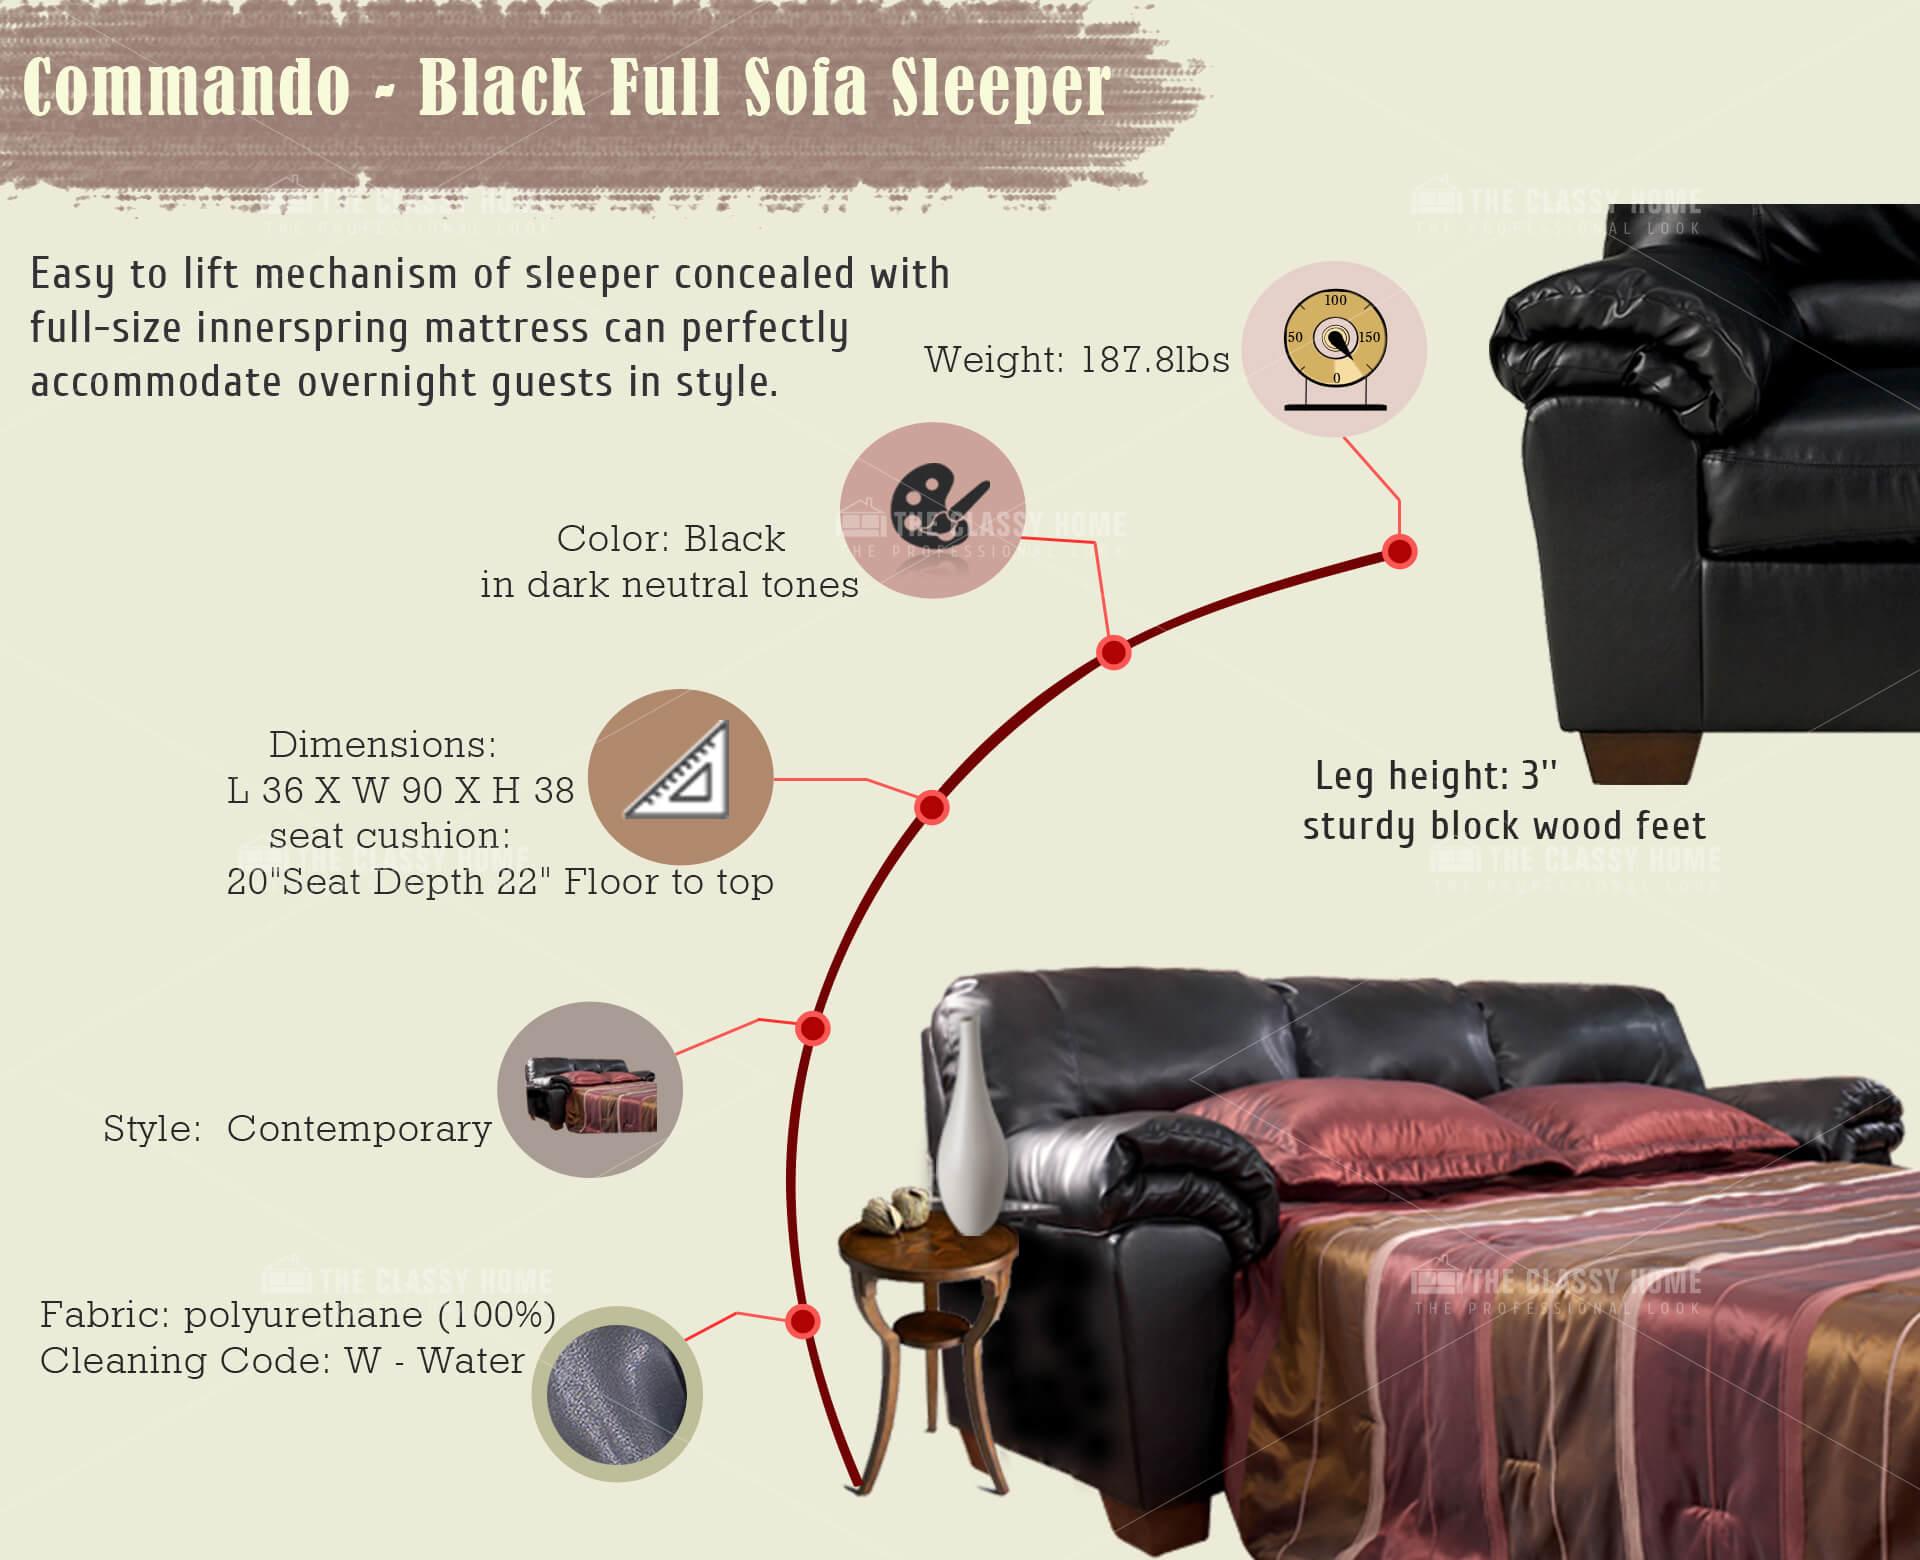 Commando Contemporary Black Faux Leather Full Sofa Sleeper The